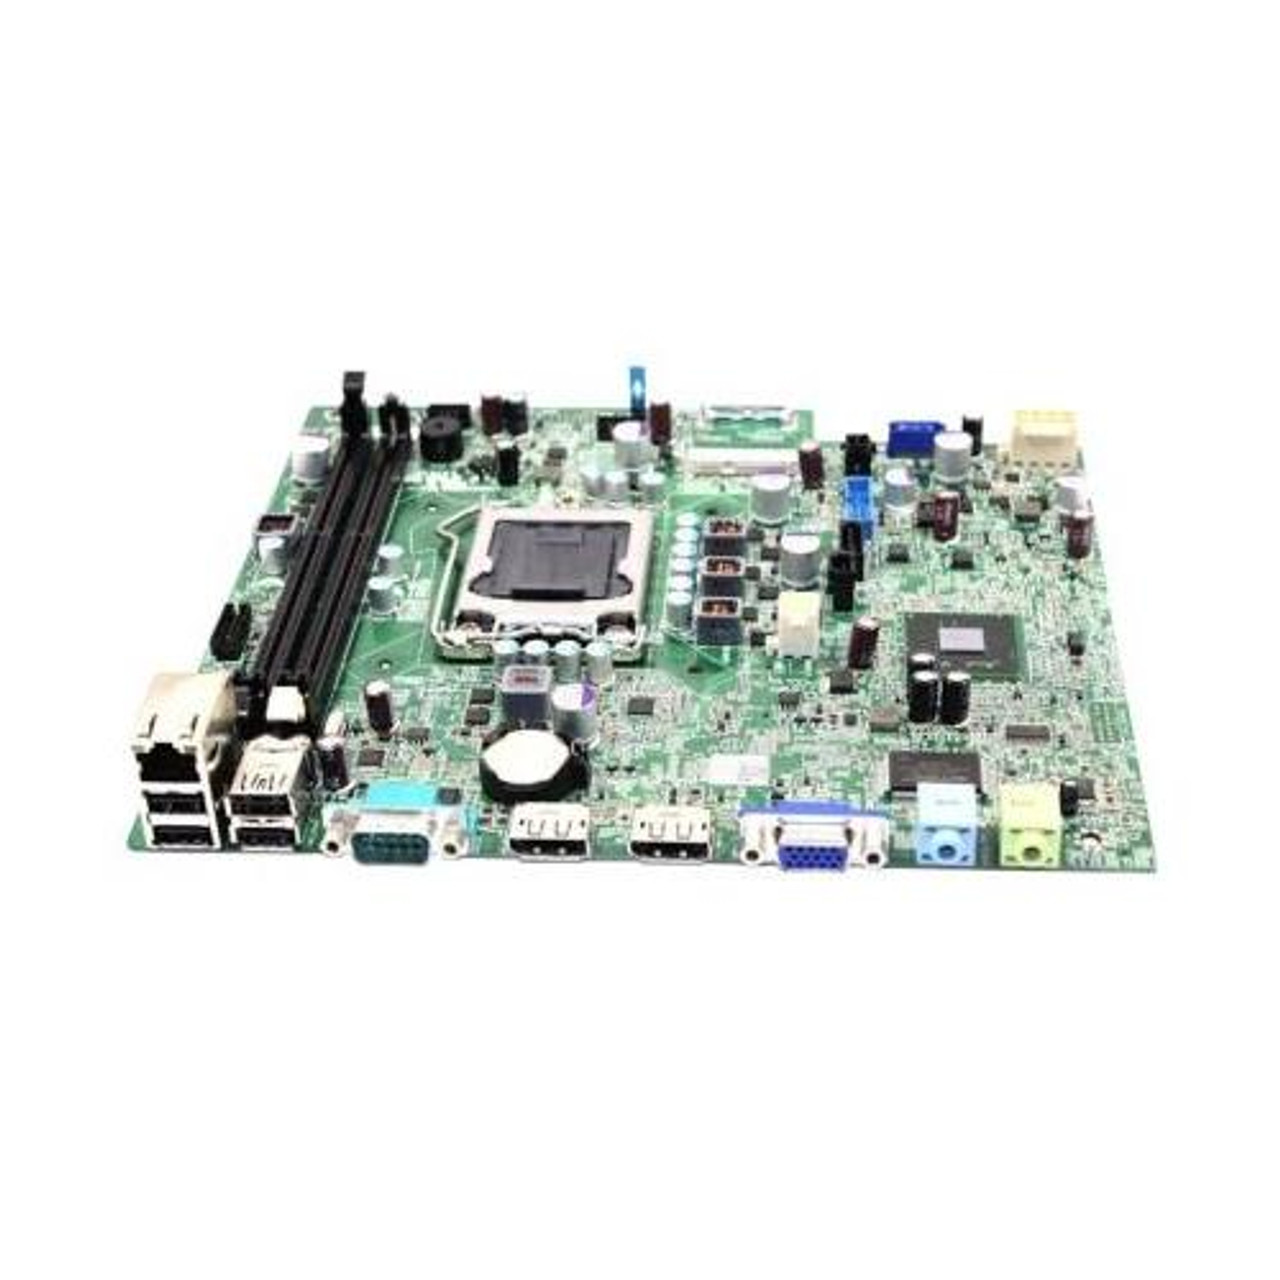 DXYK6 Dell System Board (Motherboard) Socket LGA1155 for OptiPlex 9010 SFF  (Refurbished)